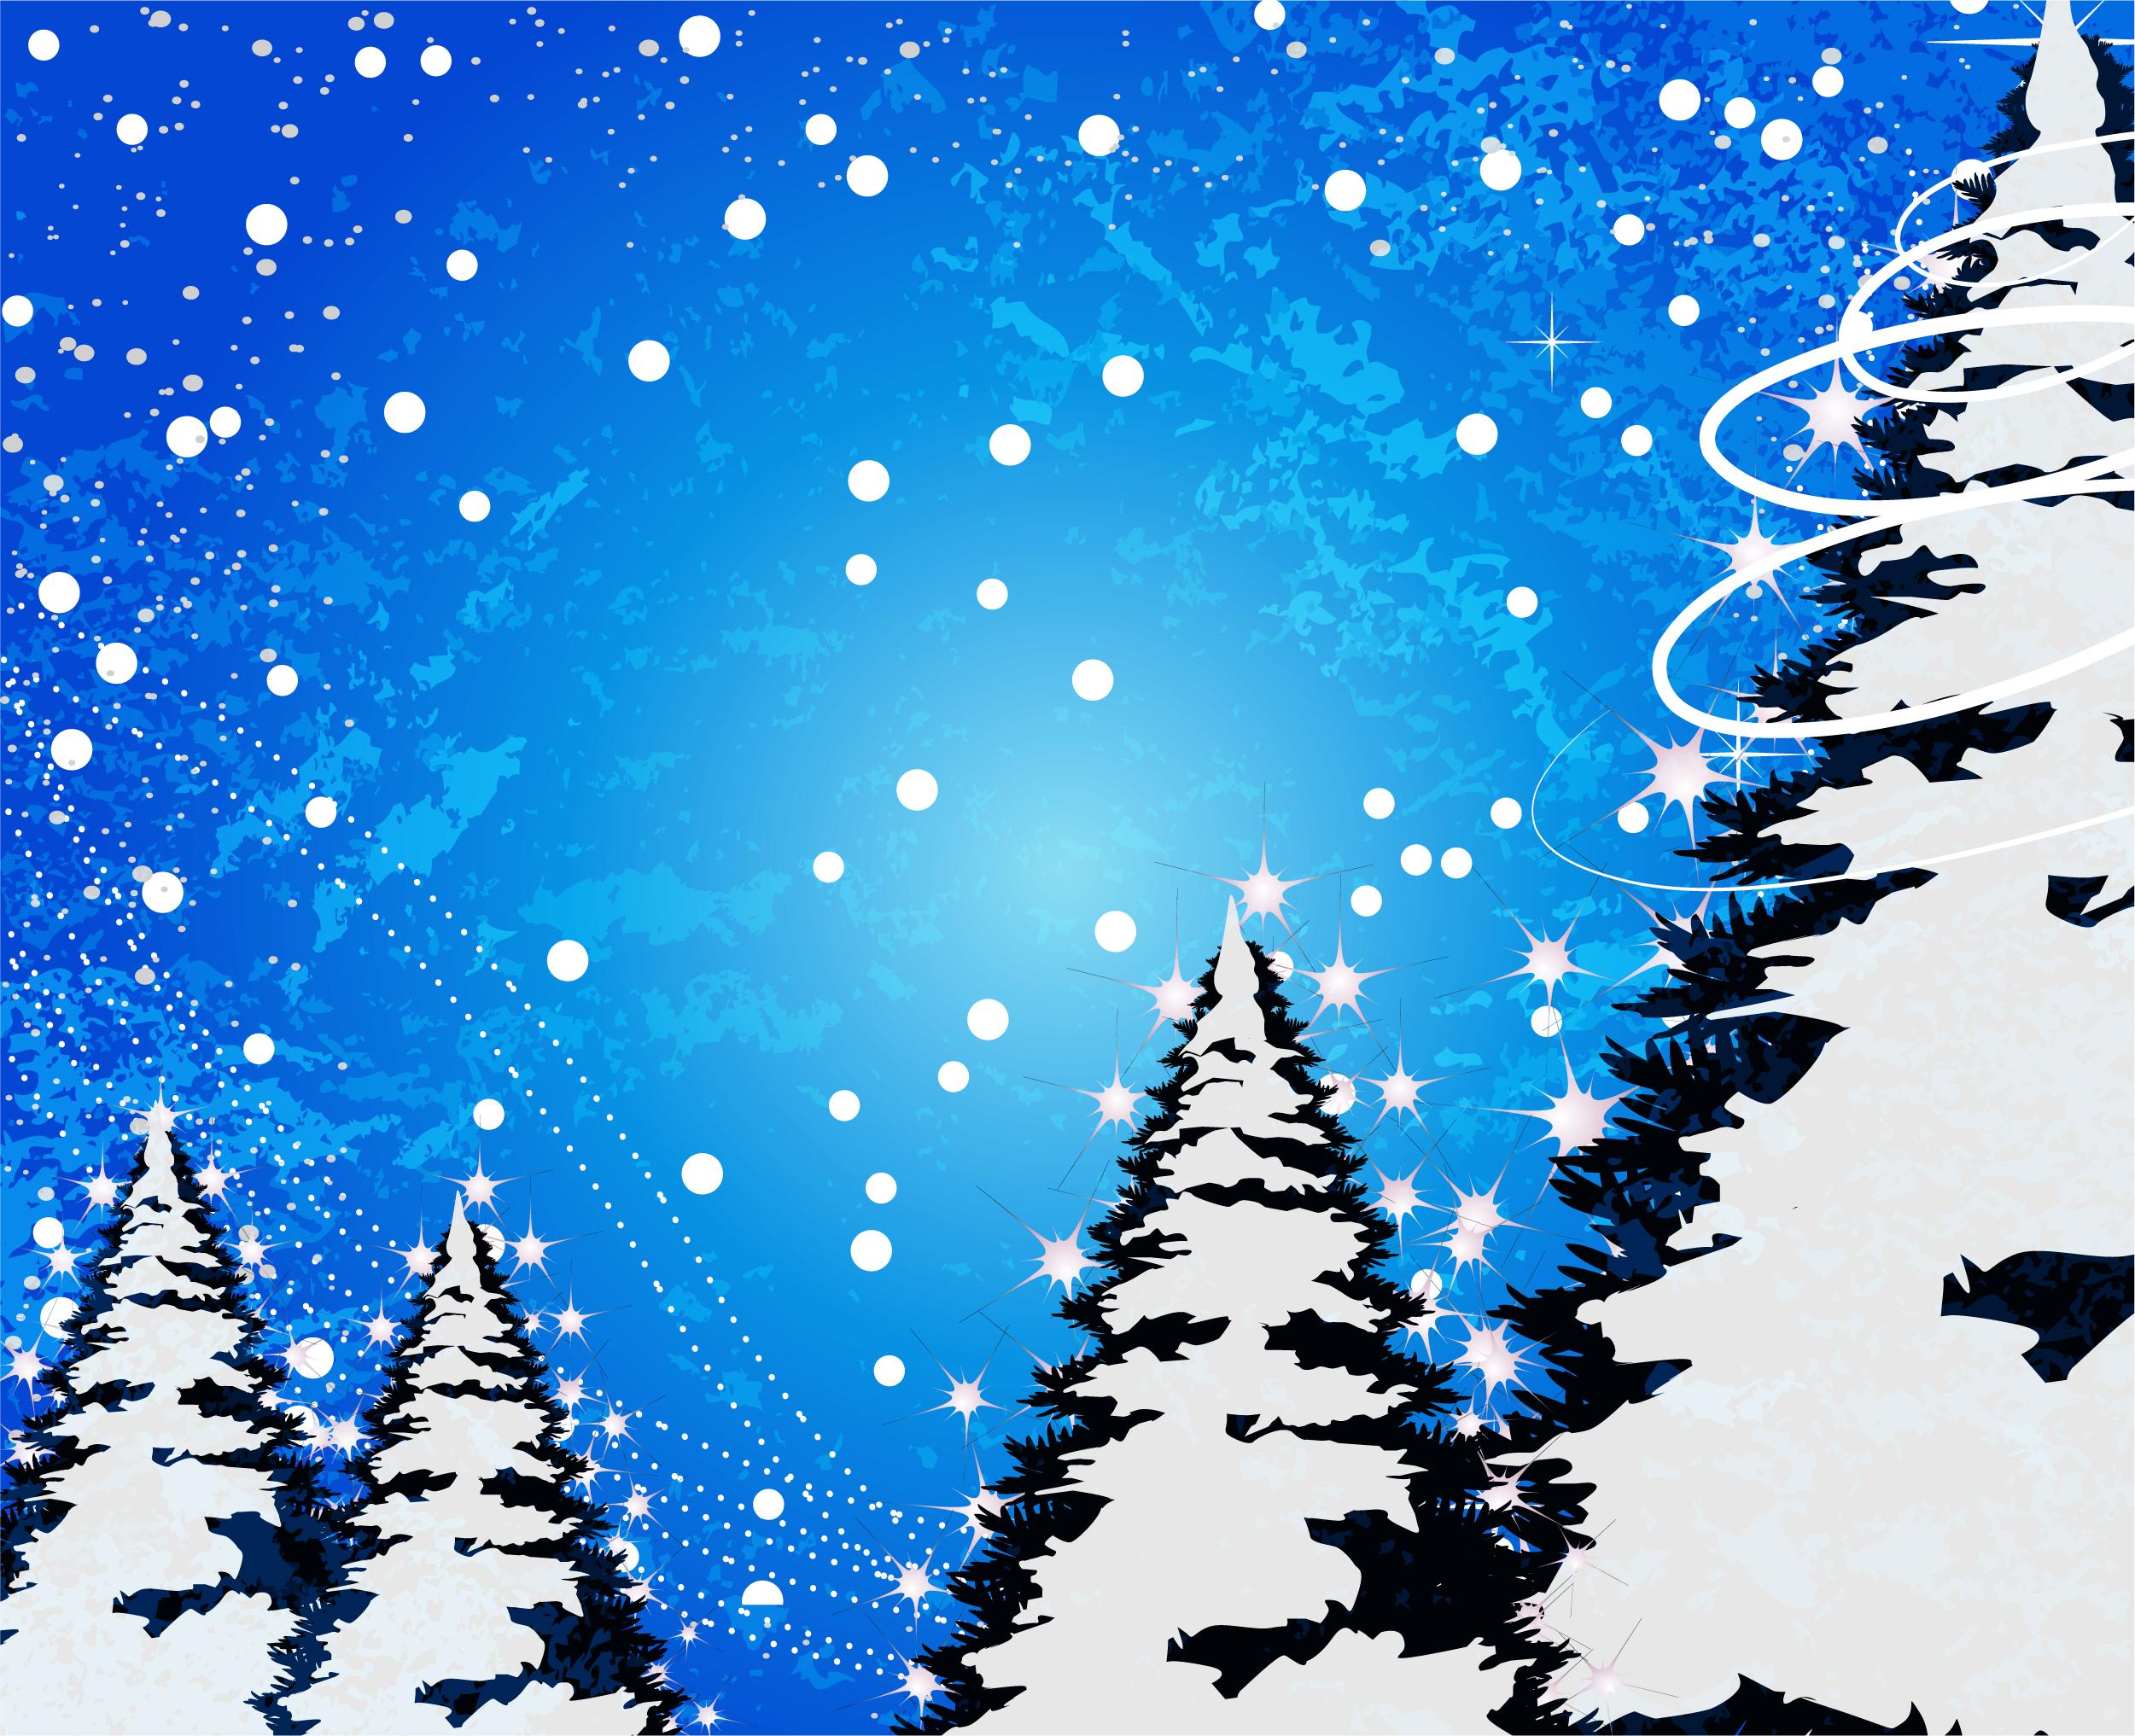 Christmas Backround.Christmas Background Vector Illustration